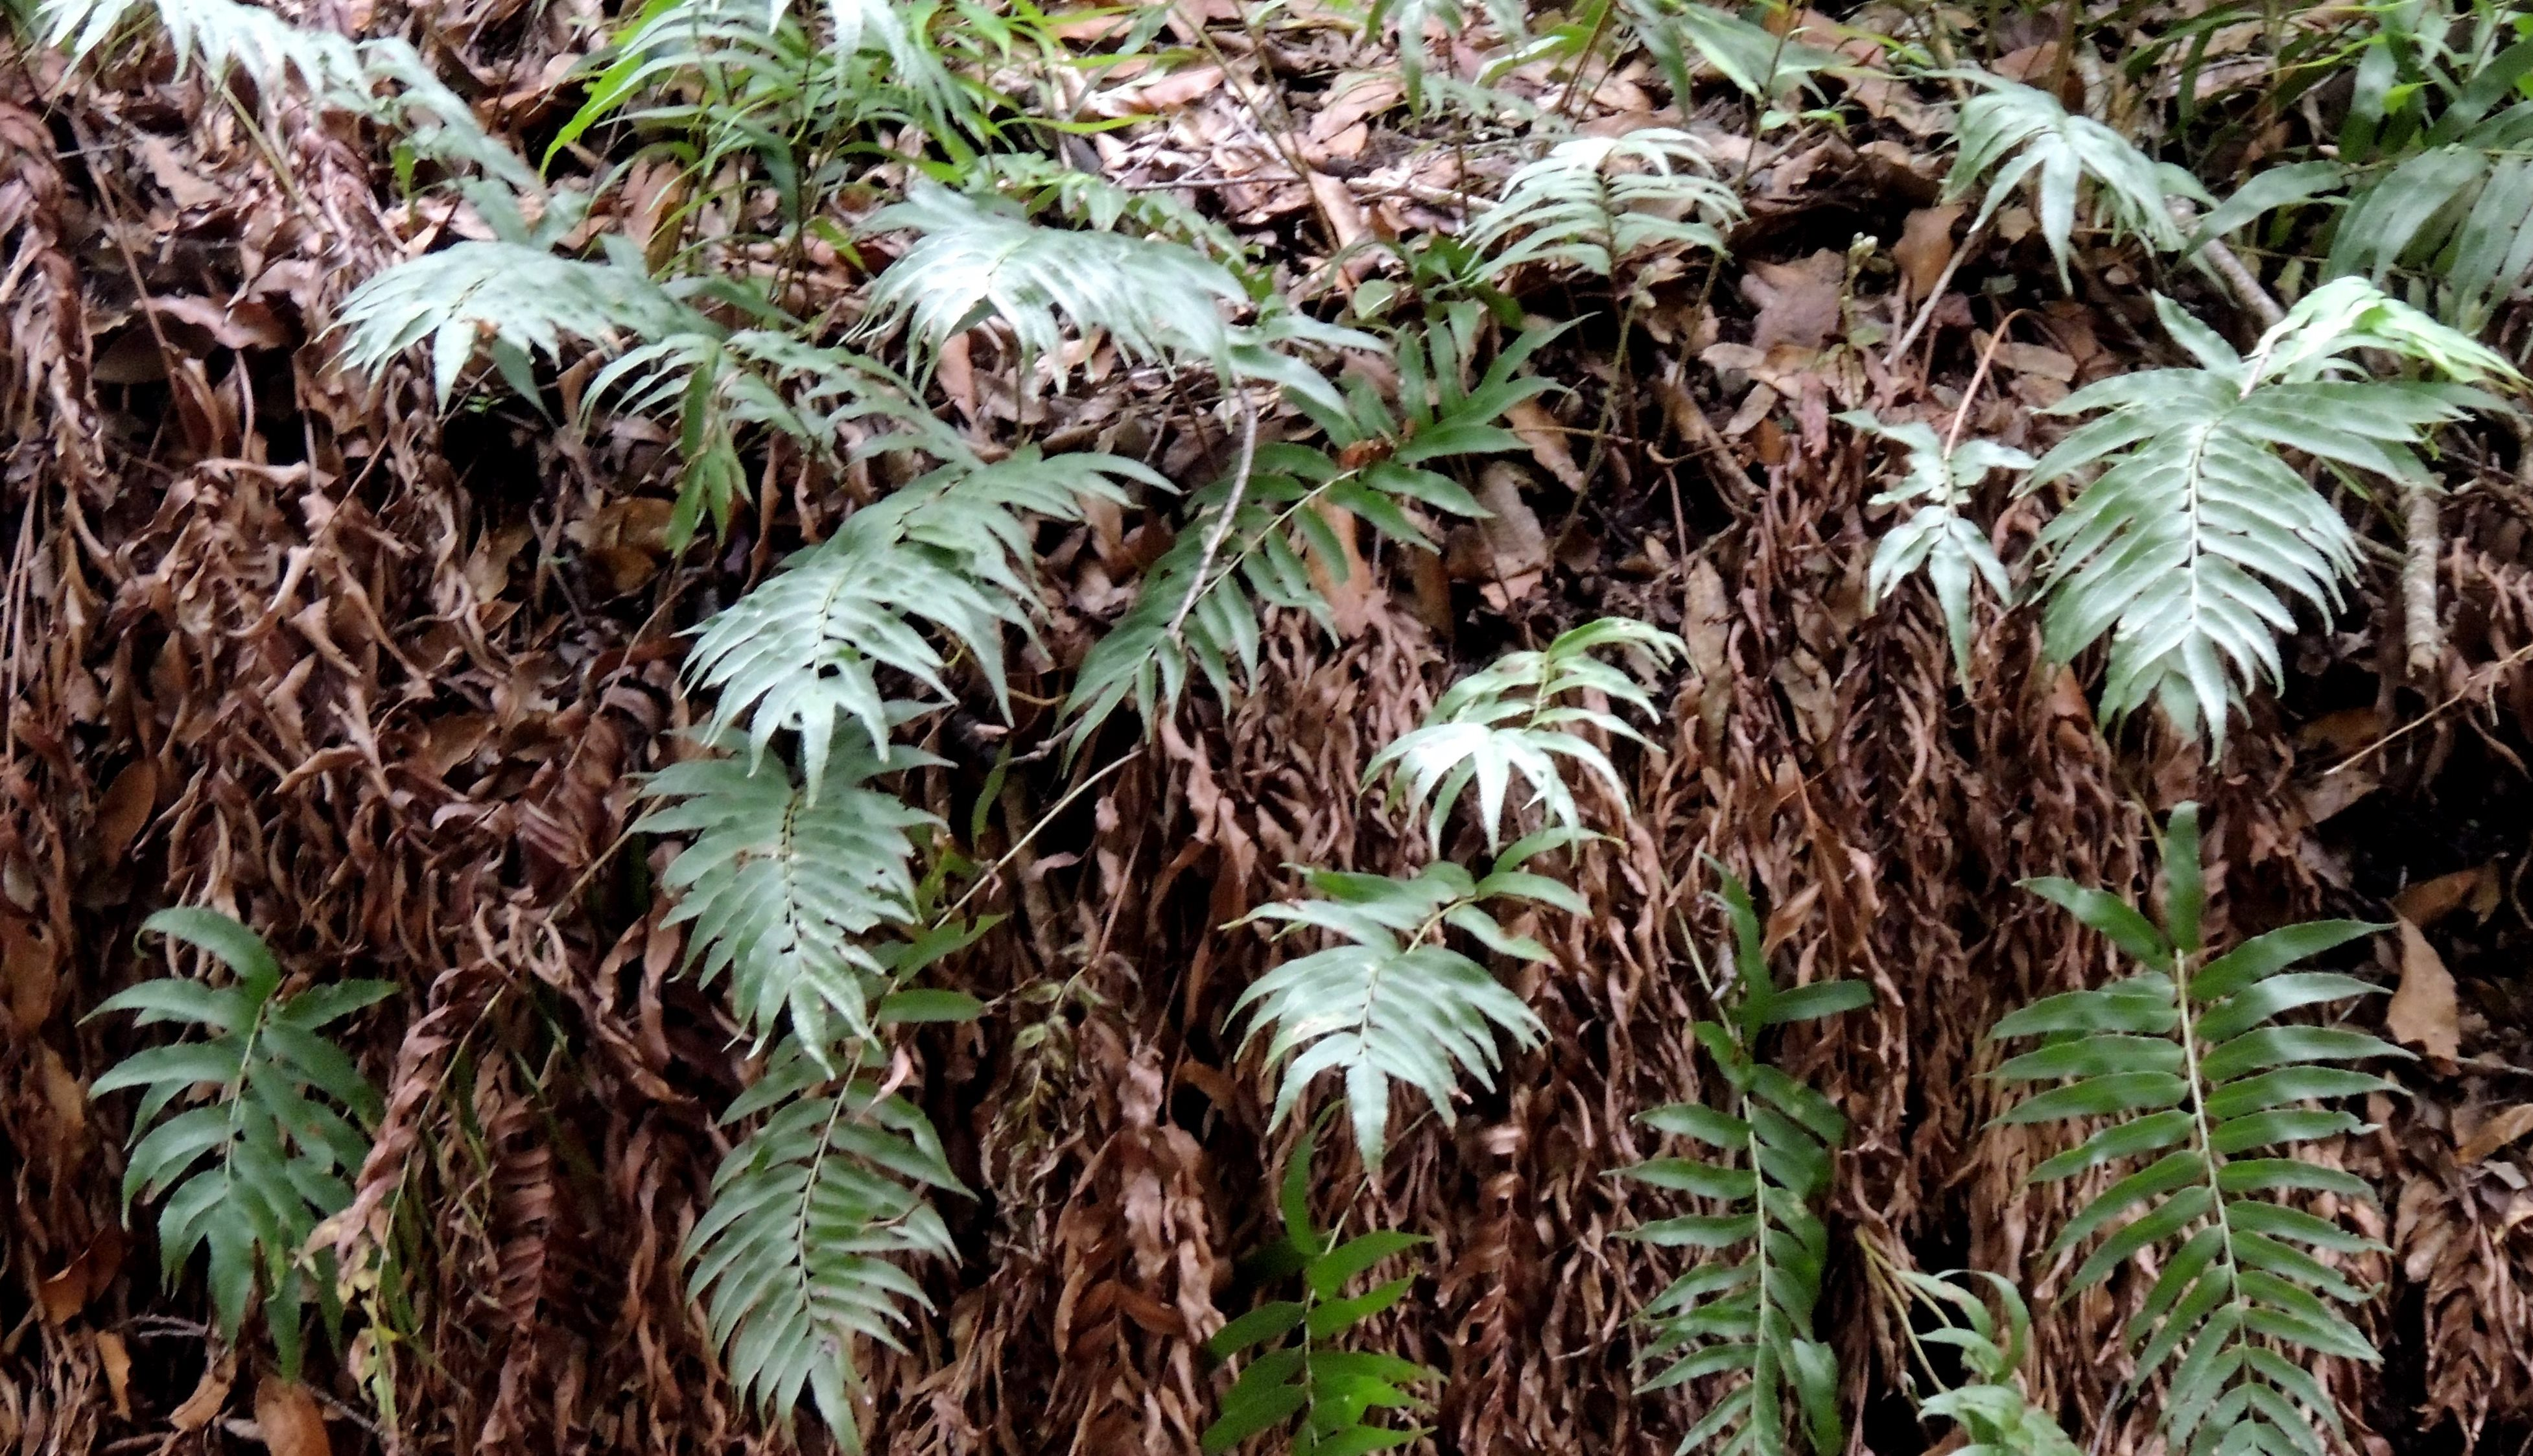 Phanerophlebia umbonata